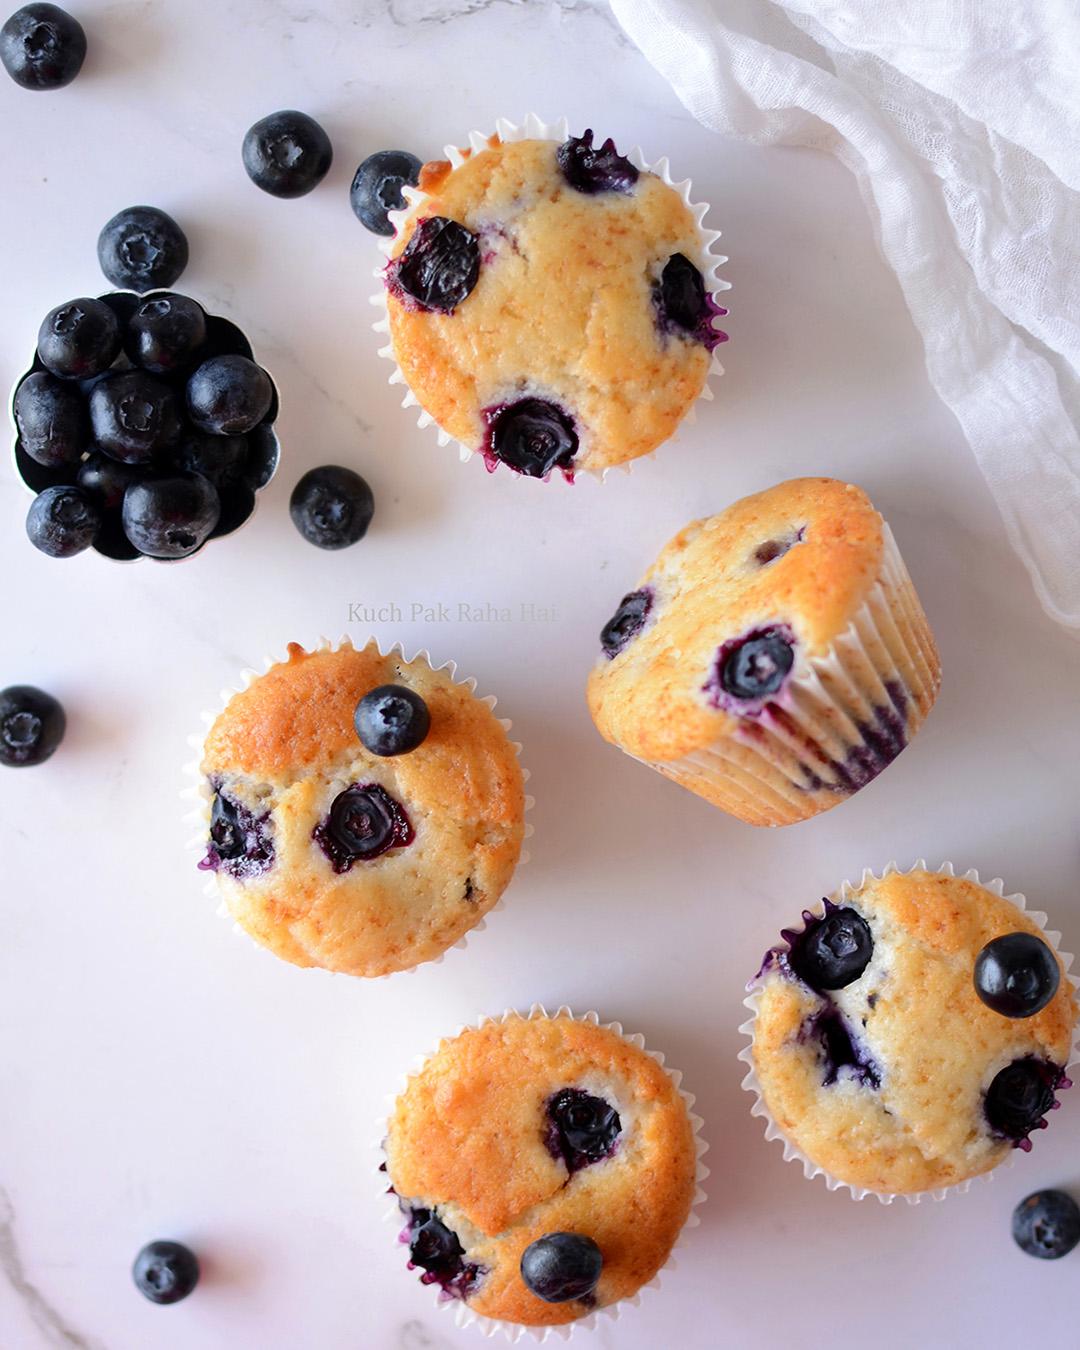 Eggless Lemon Blueberry Muffins Recipe